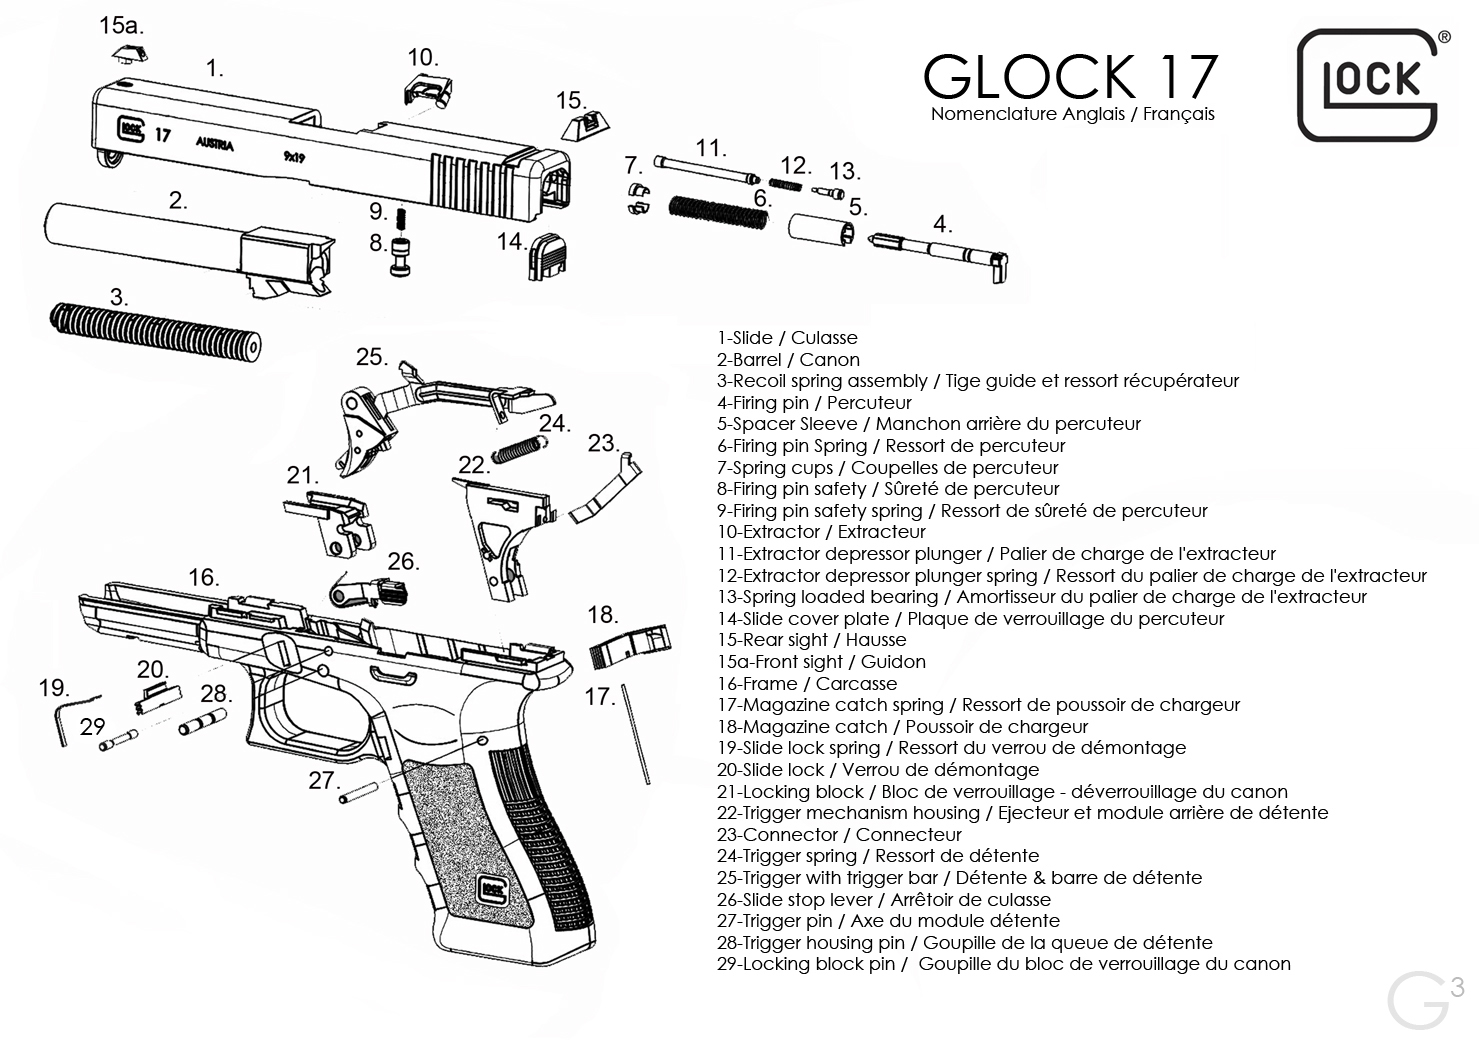 revolver nomenclature diagram revolver get free image about wiring diagram